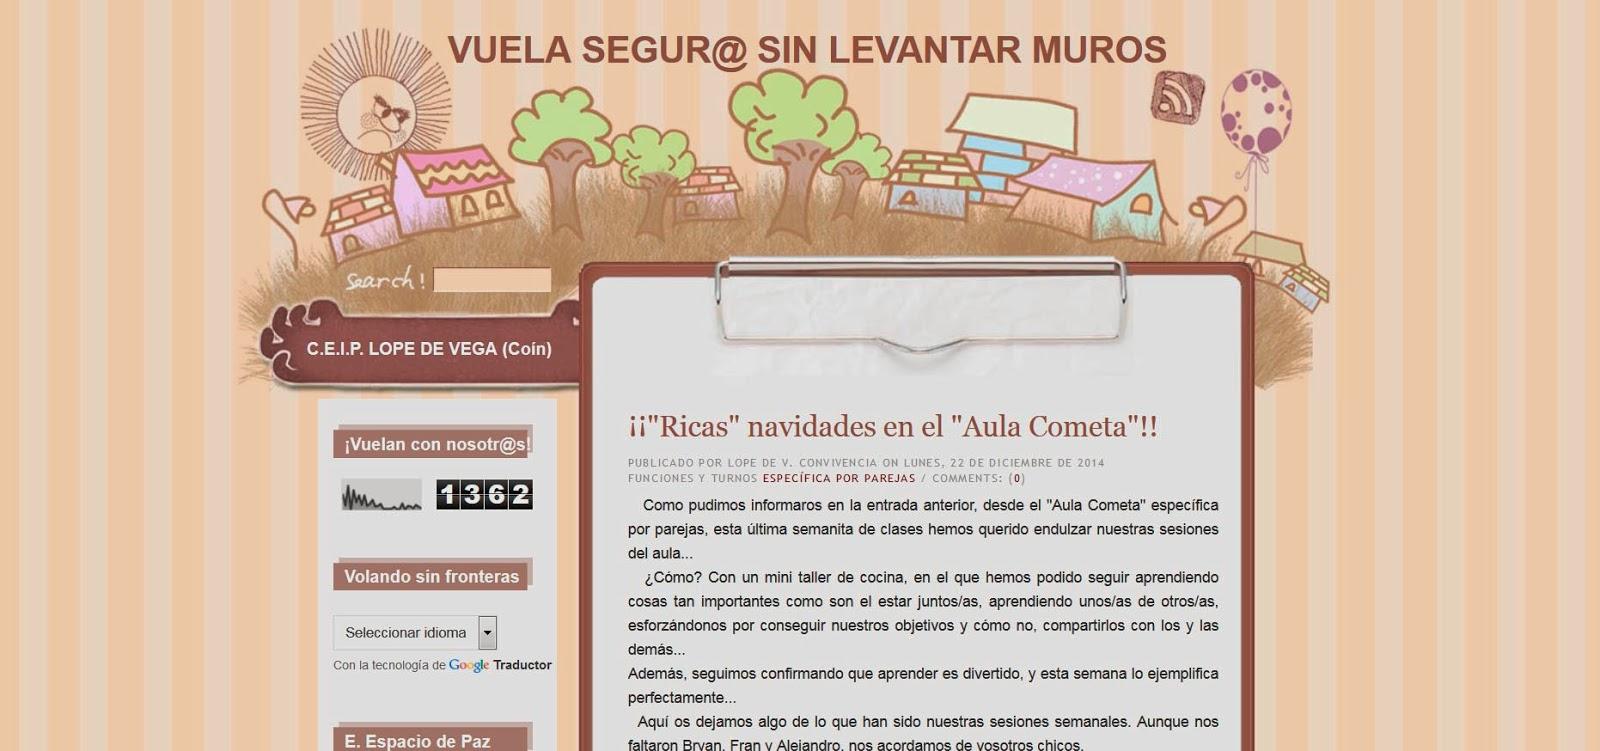 http://plandeconvivencialopedevega.blogspot.com.es/